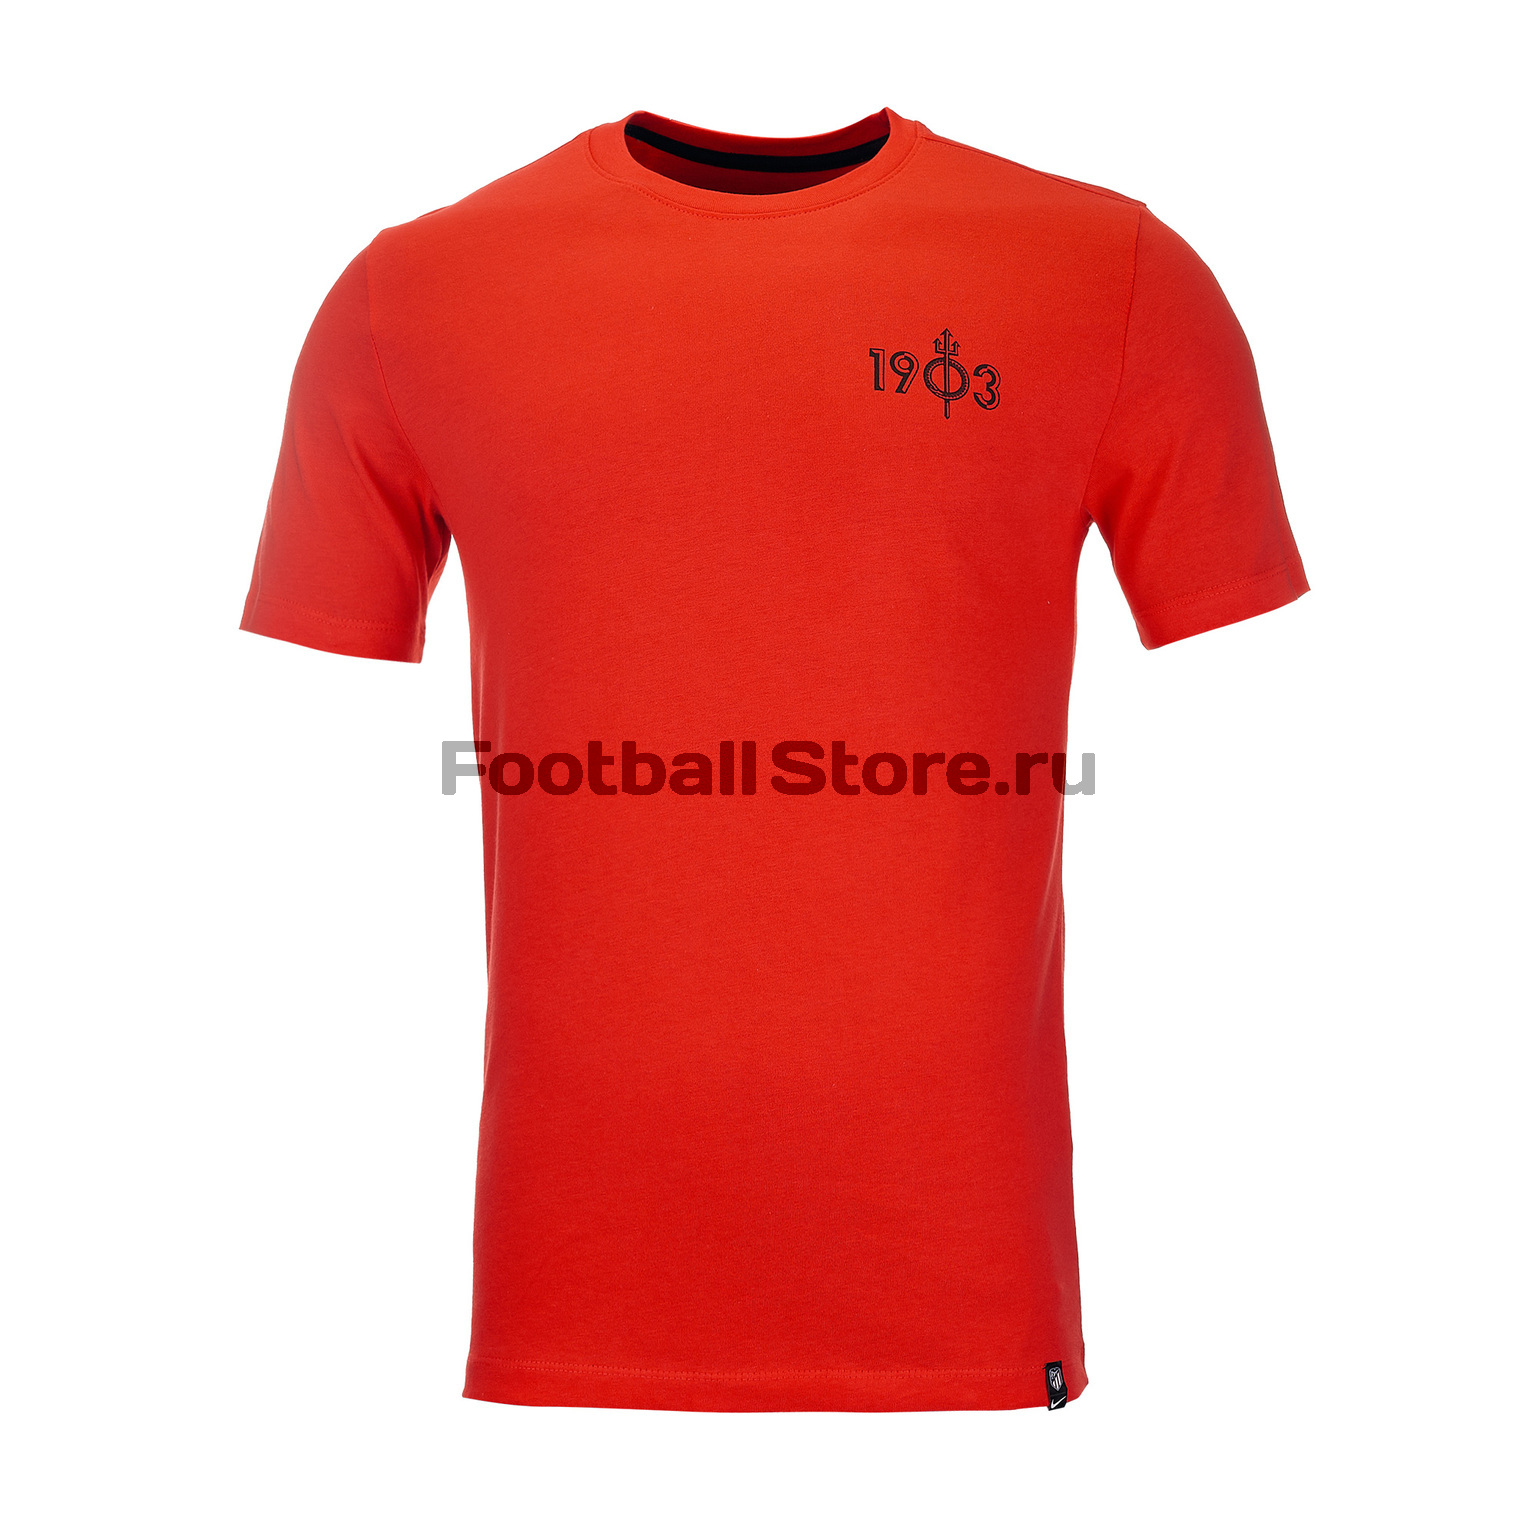 все цены на Футболка хлопковая Nike Atletico Madrid AQ7518-600 онлайн